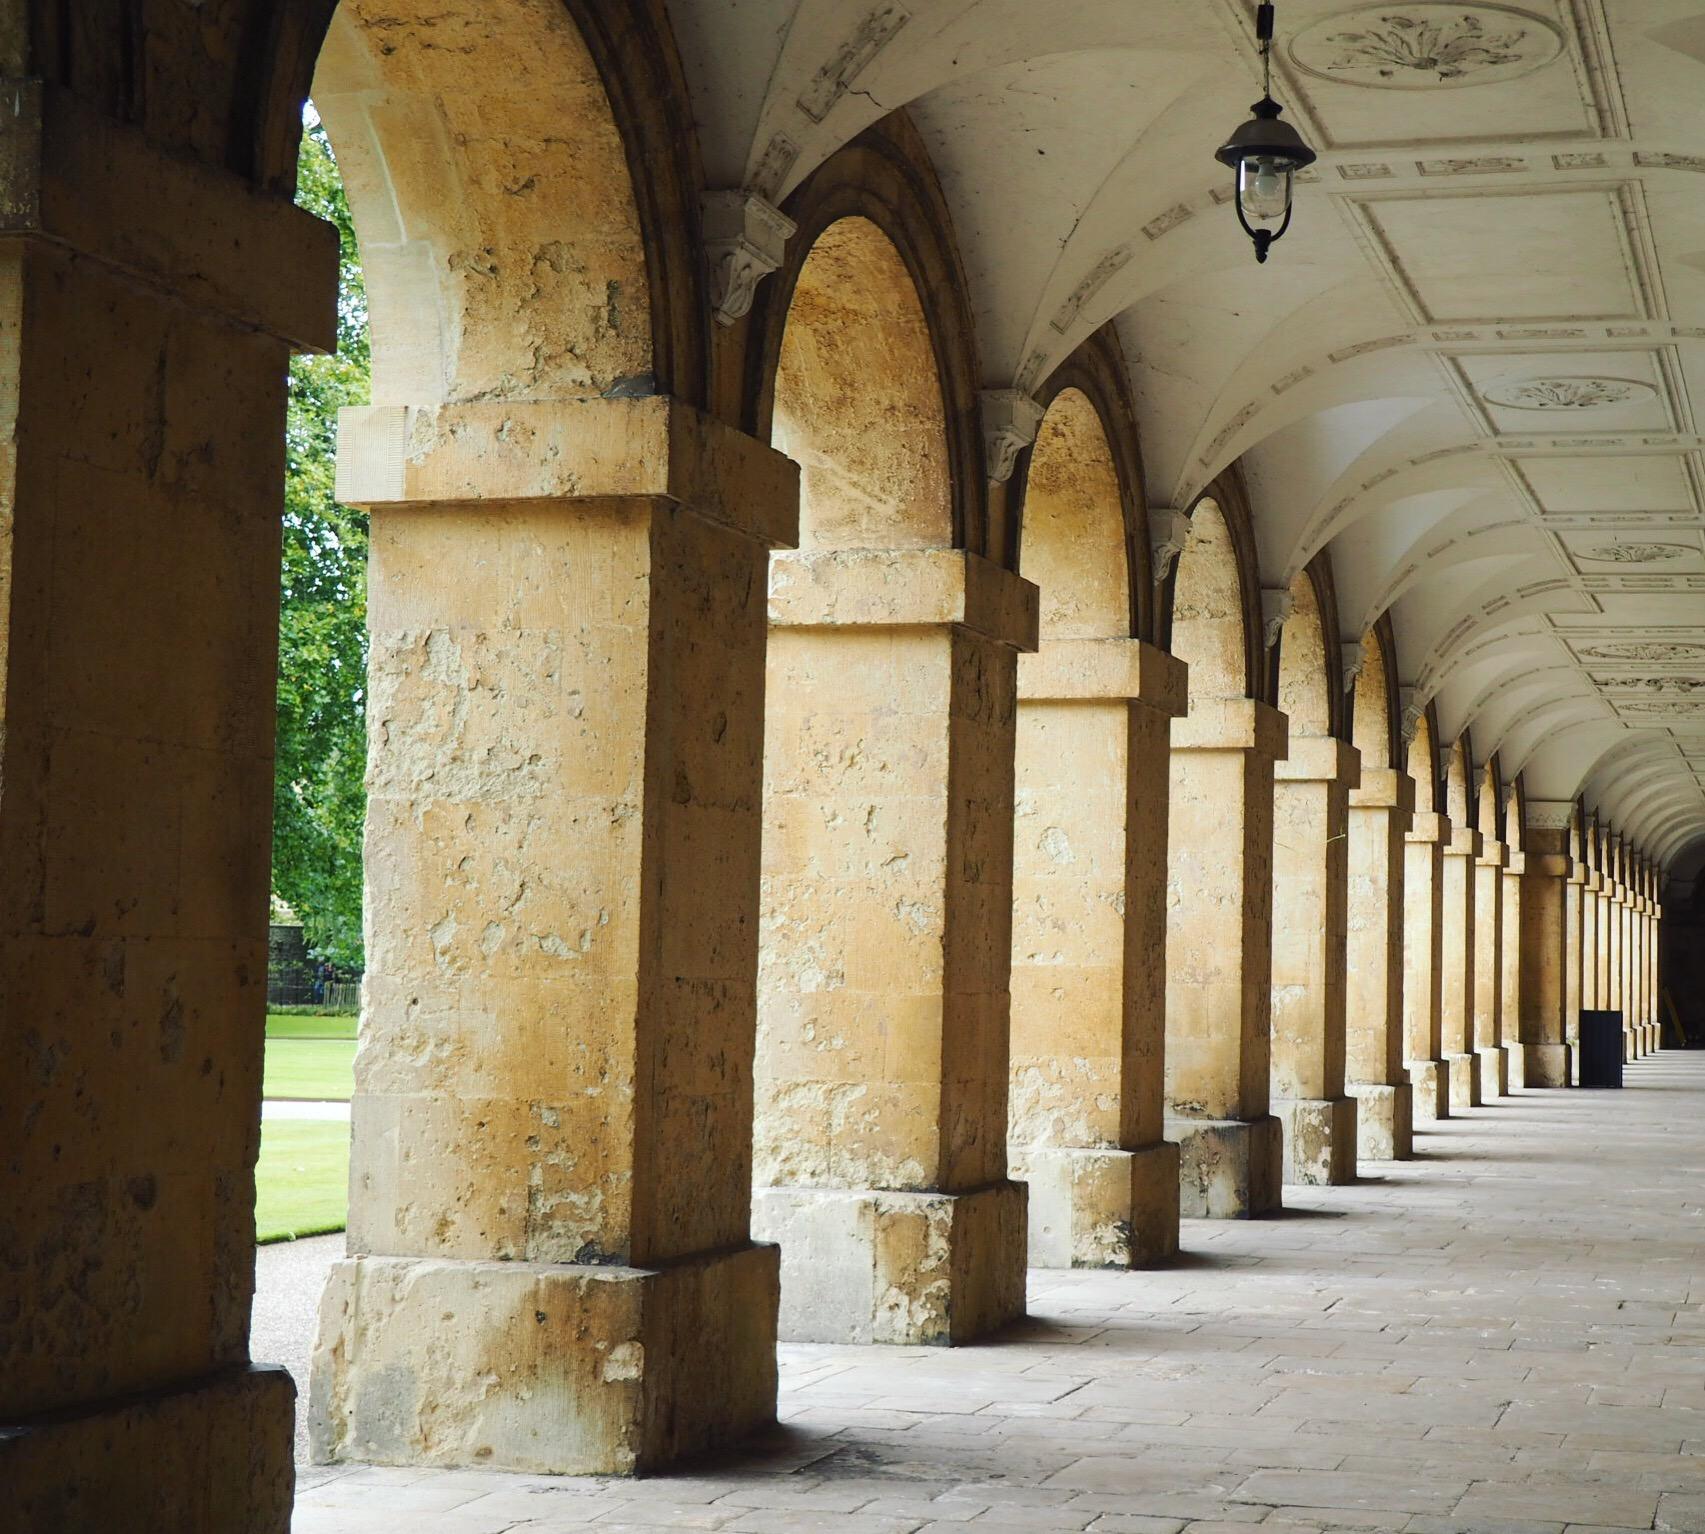 A trip to Oxford